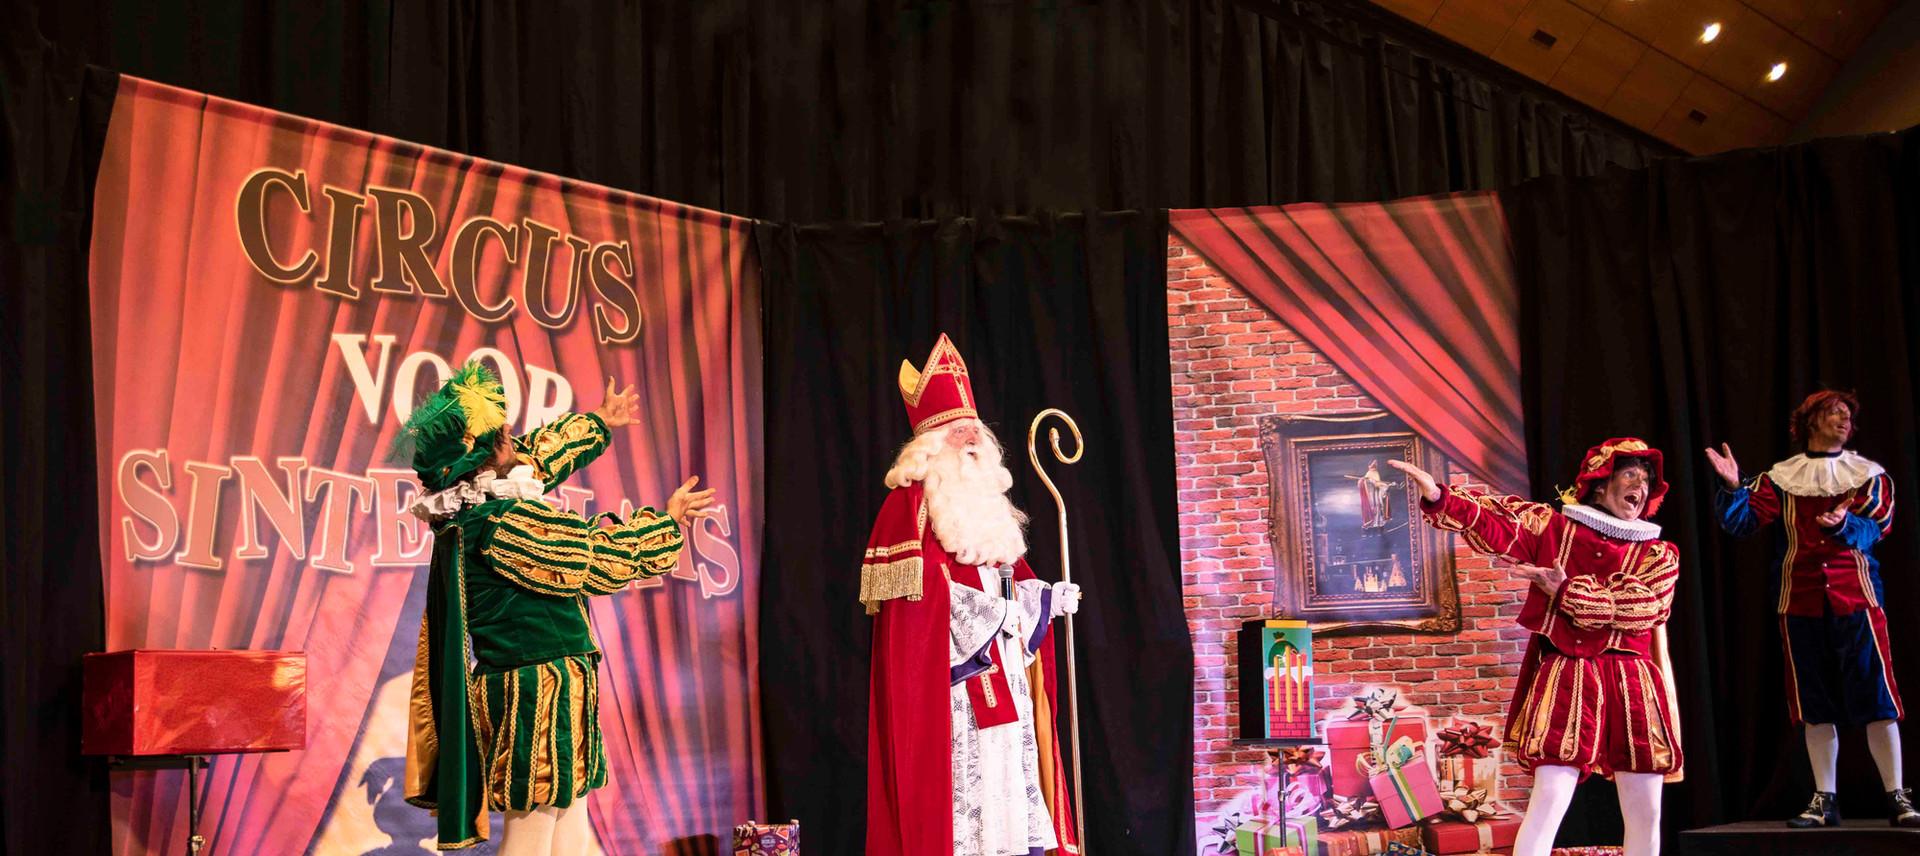 Theater sinterklaas show voorstelling be